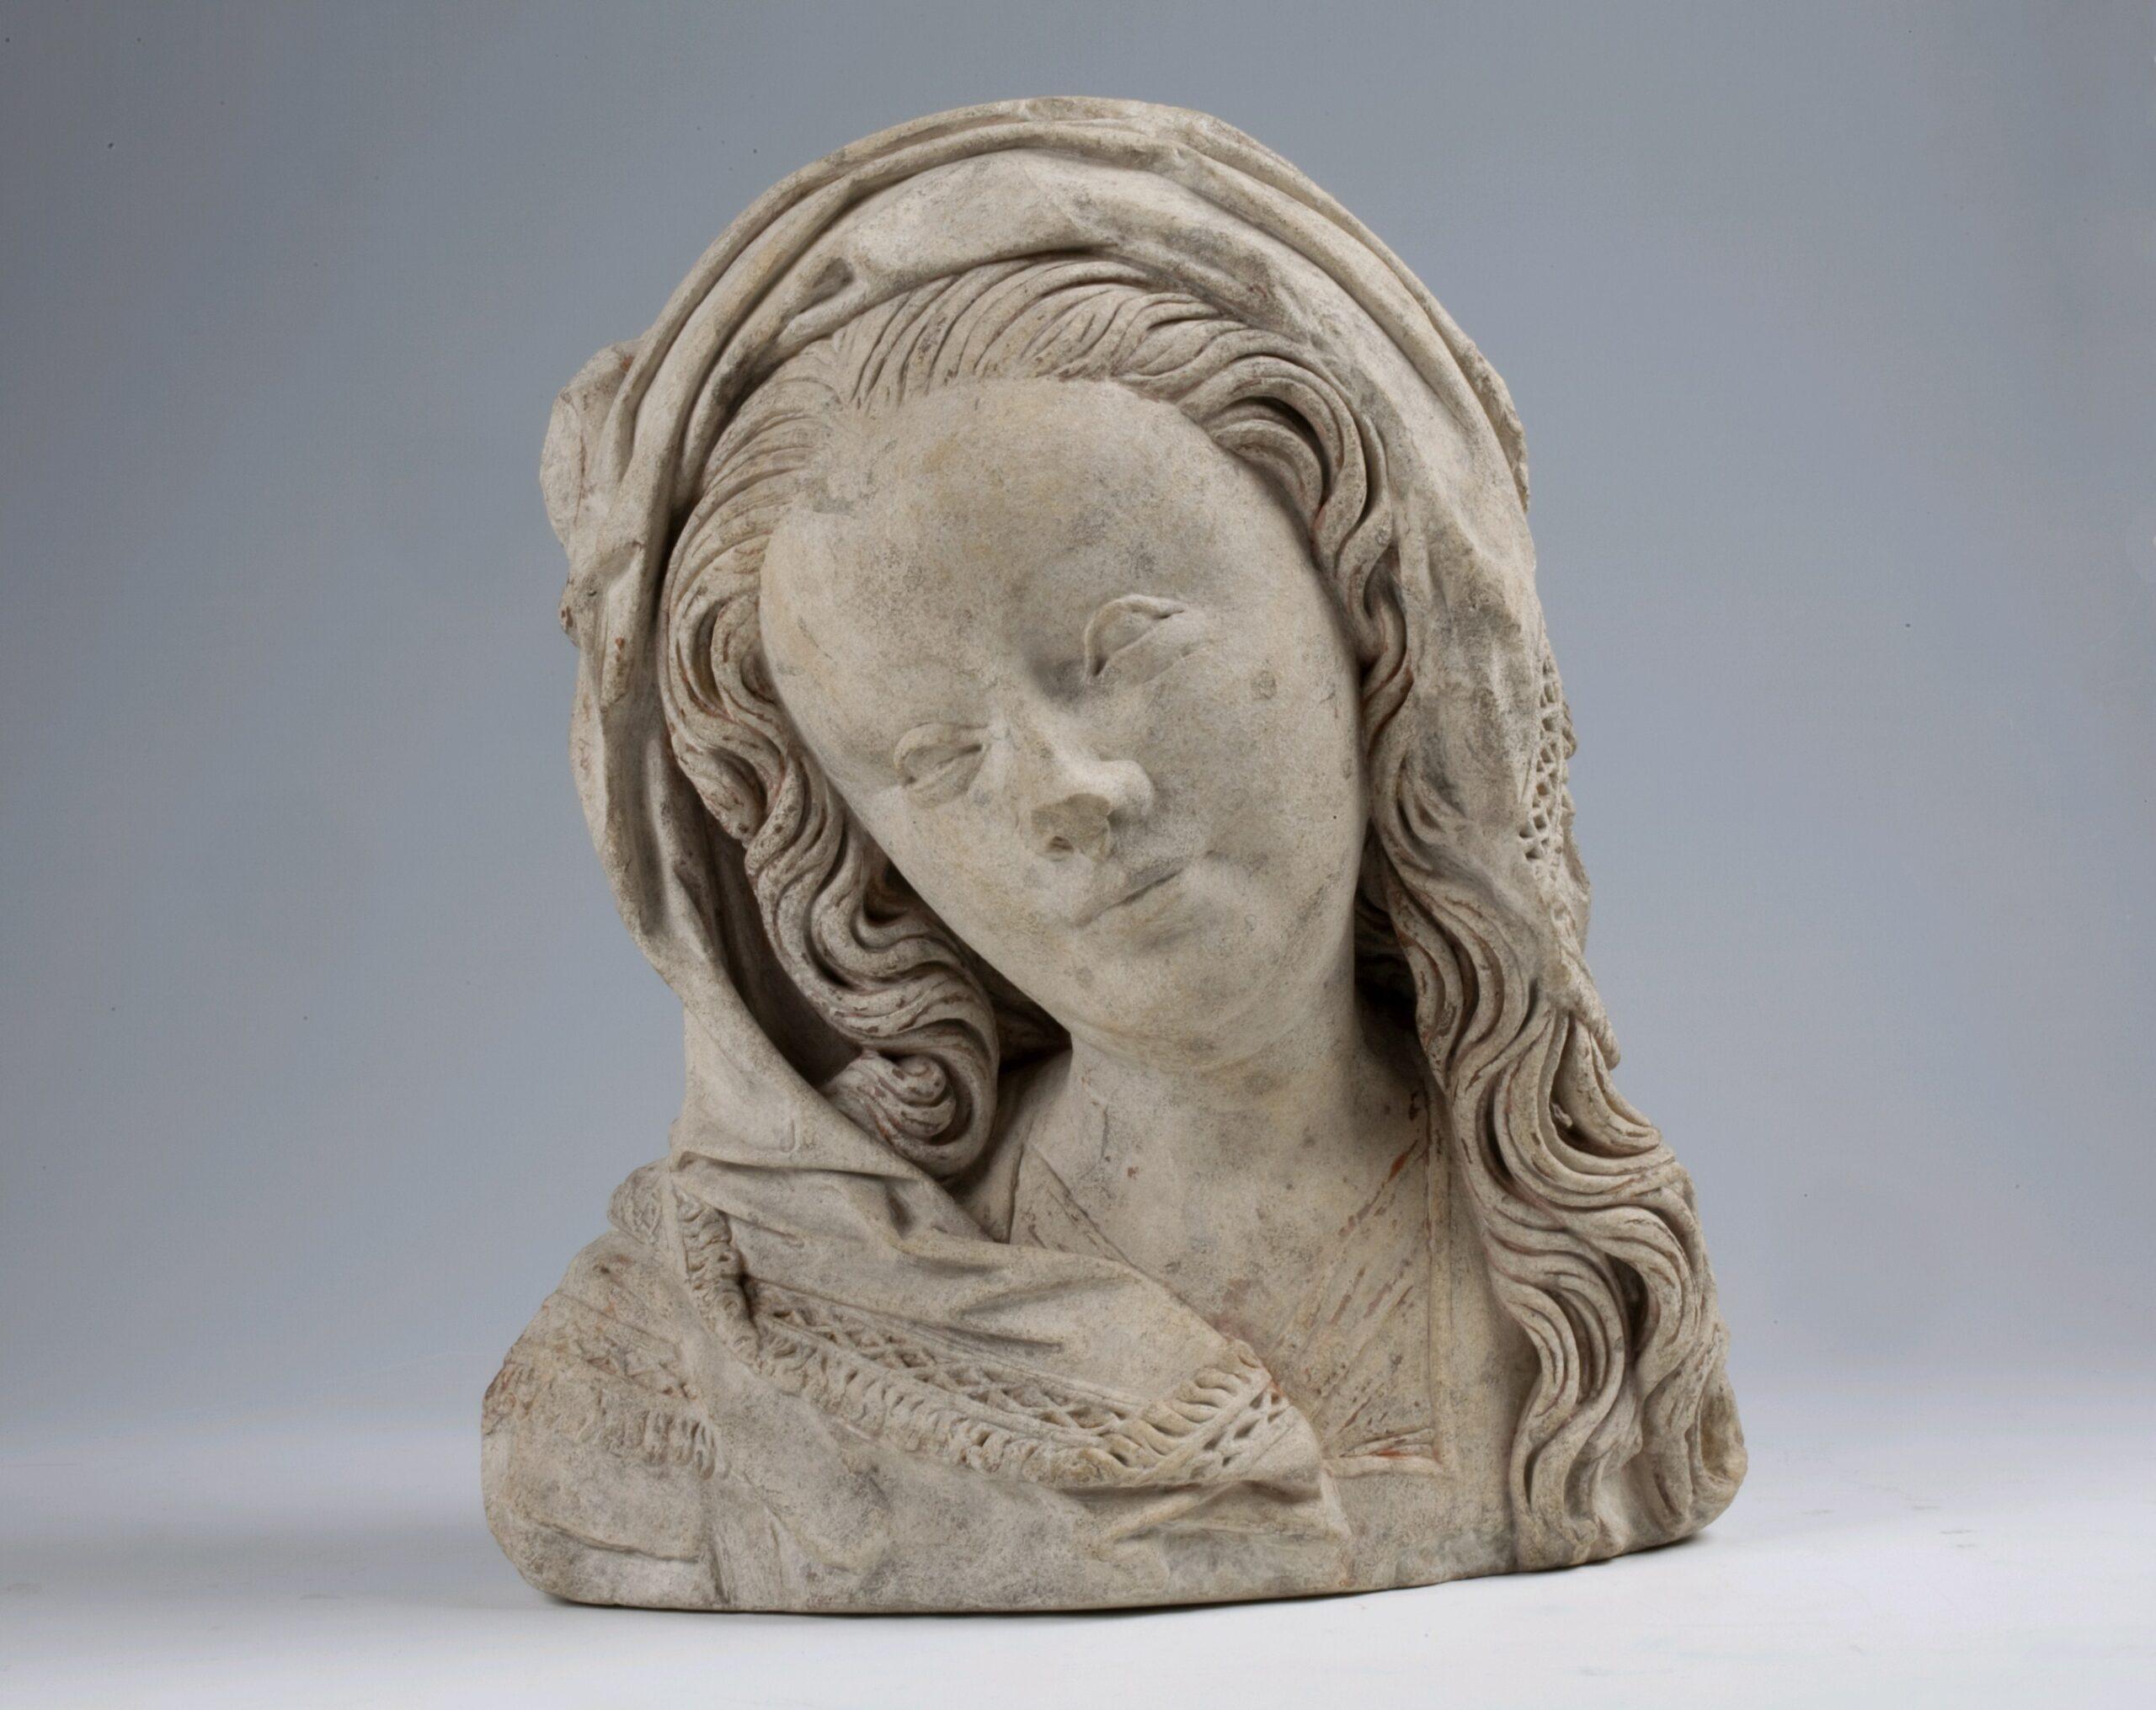 Master of the Utrecht Female Head of Stone, <em>Stone female head</em>, first quarter sixteenth century<br/> Utrecht, Museum Catharijneconvent